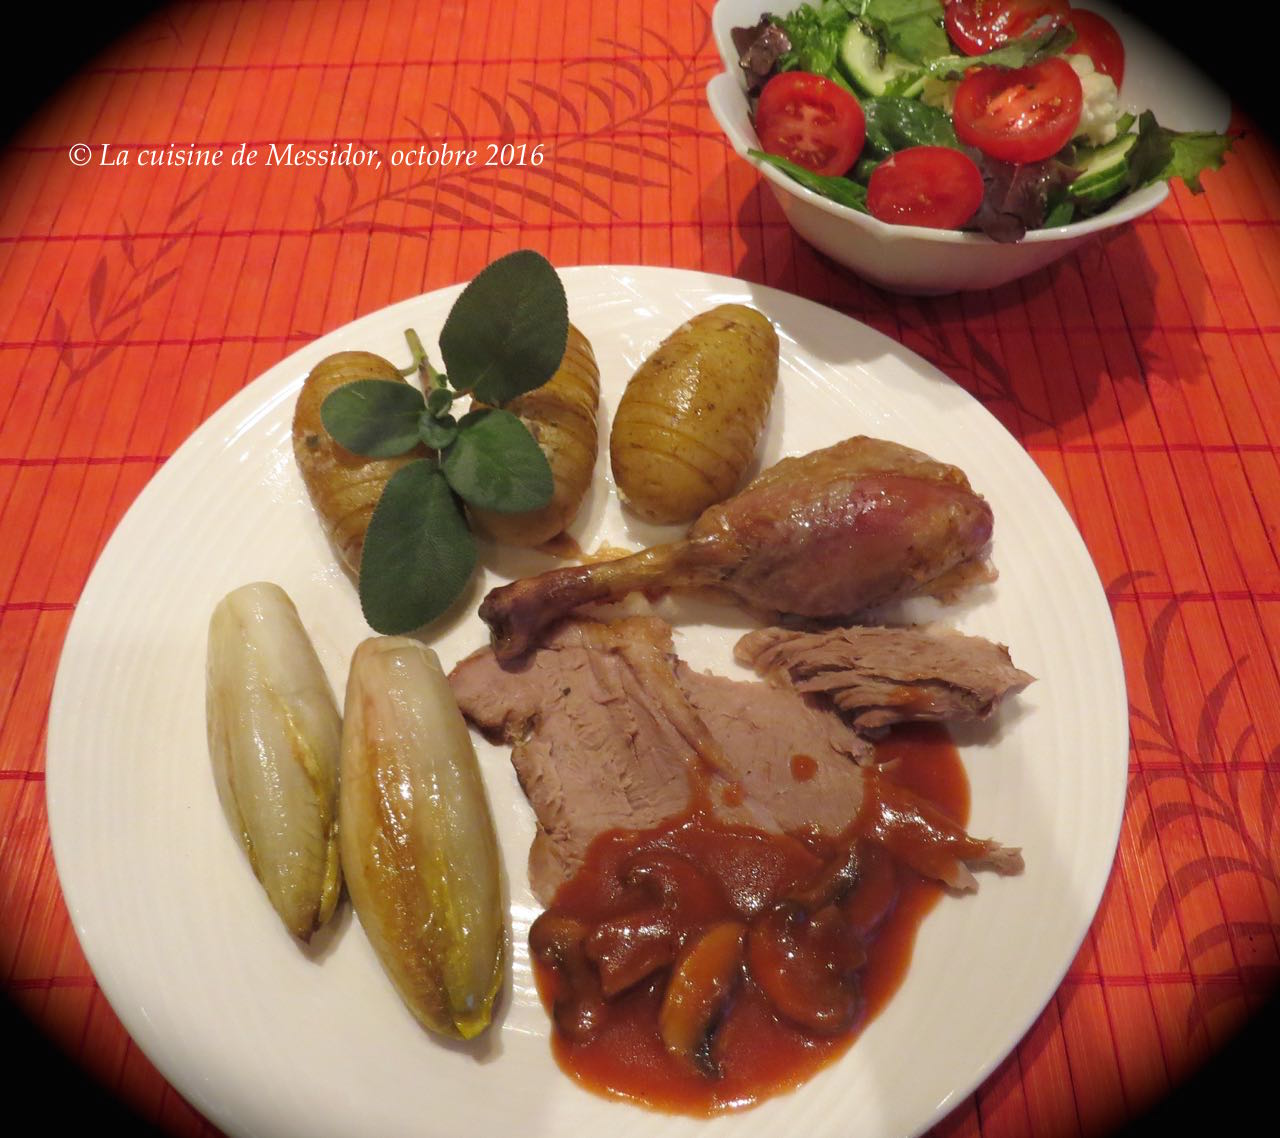 La cuisine de messidor canard entier au four cuisson - Temps de cuisson magret de canard au four ...